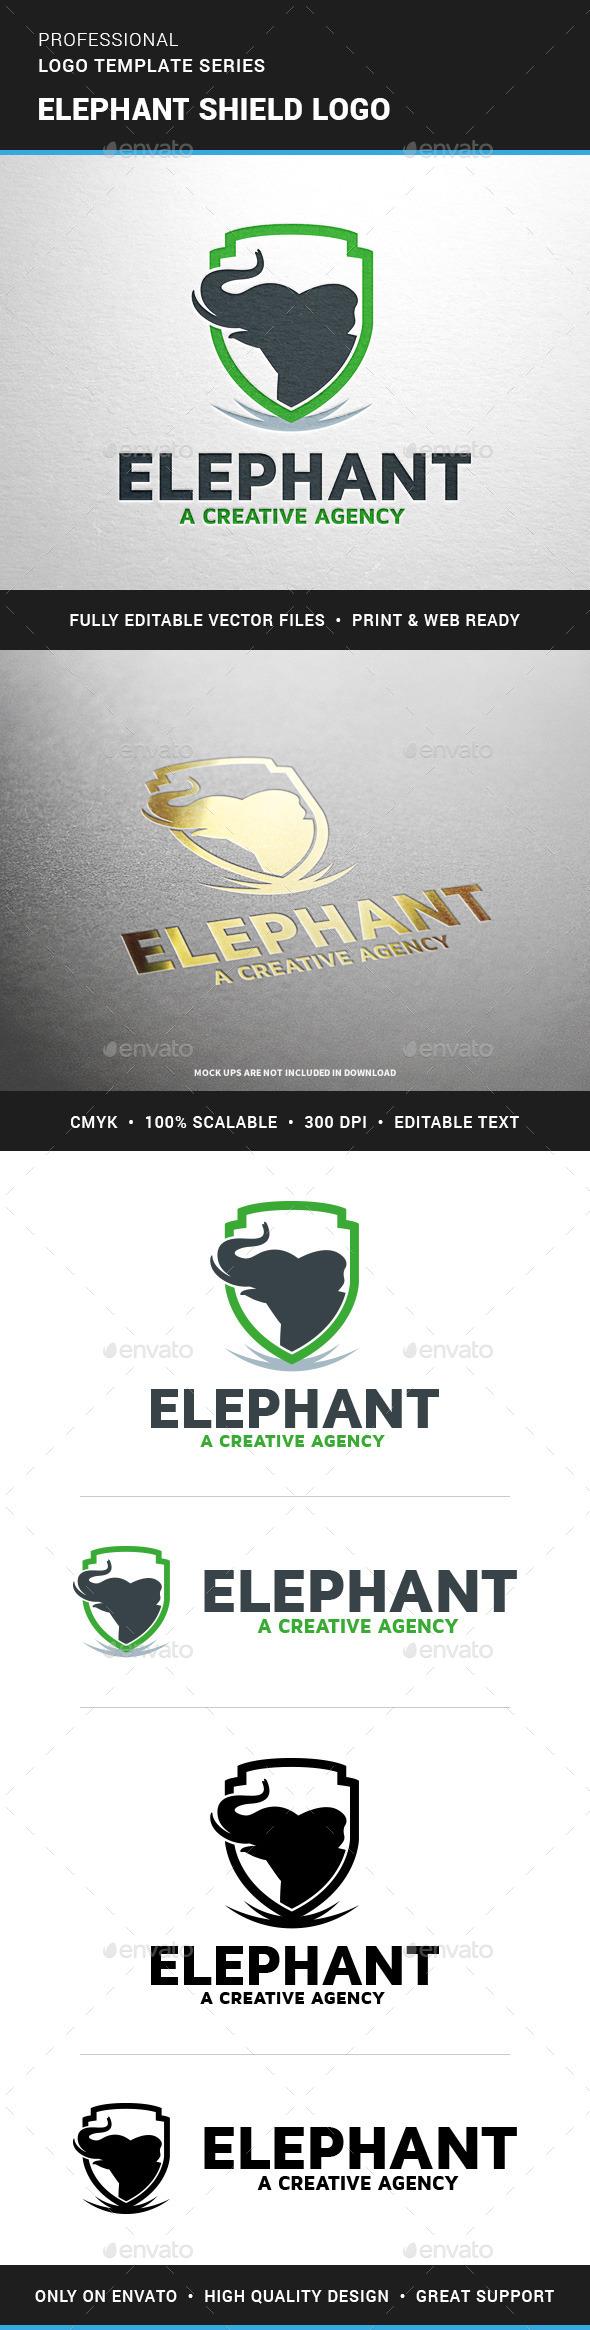 Elephant Shield Logo Template